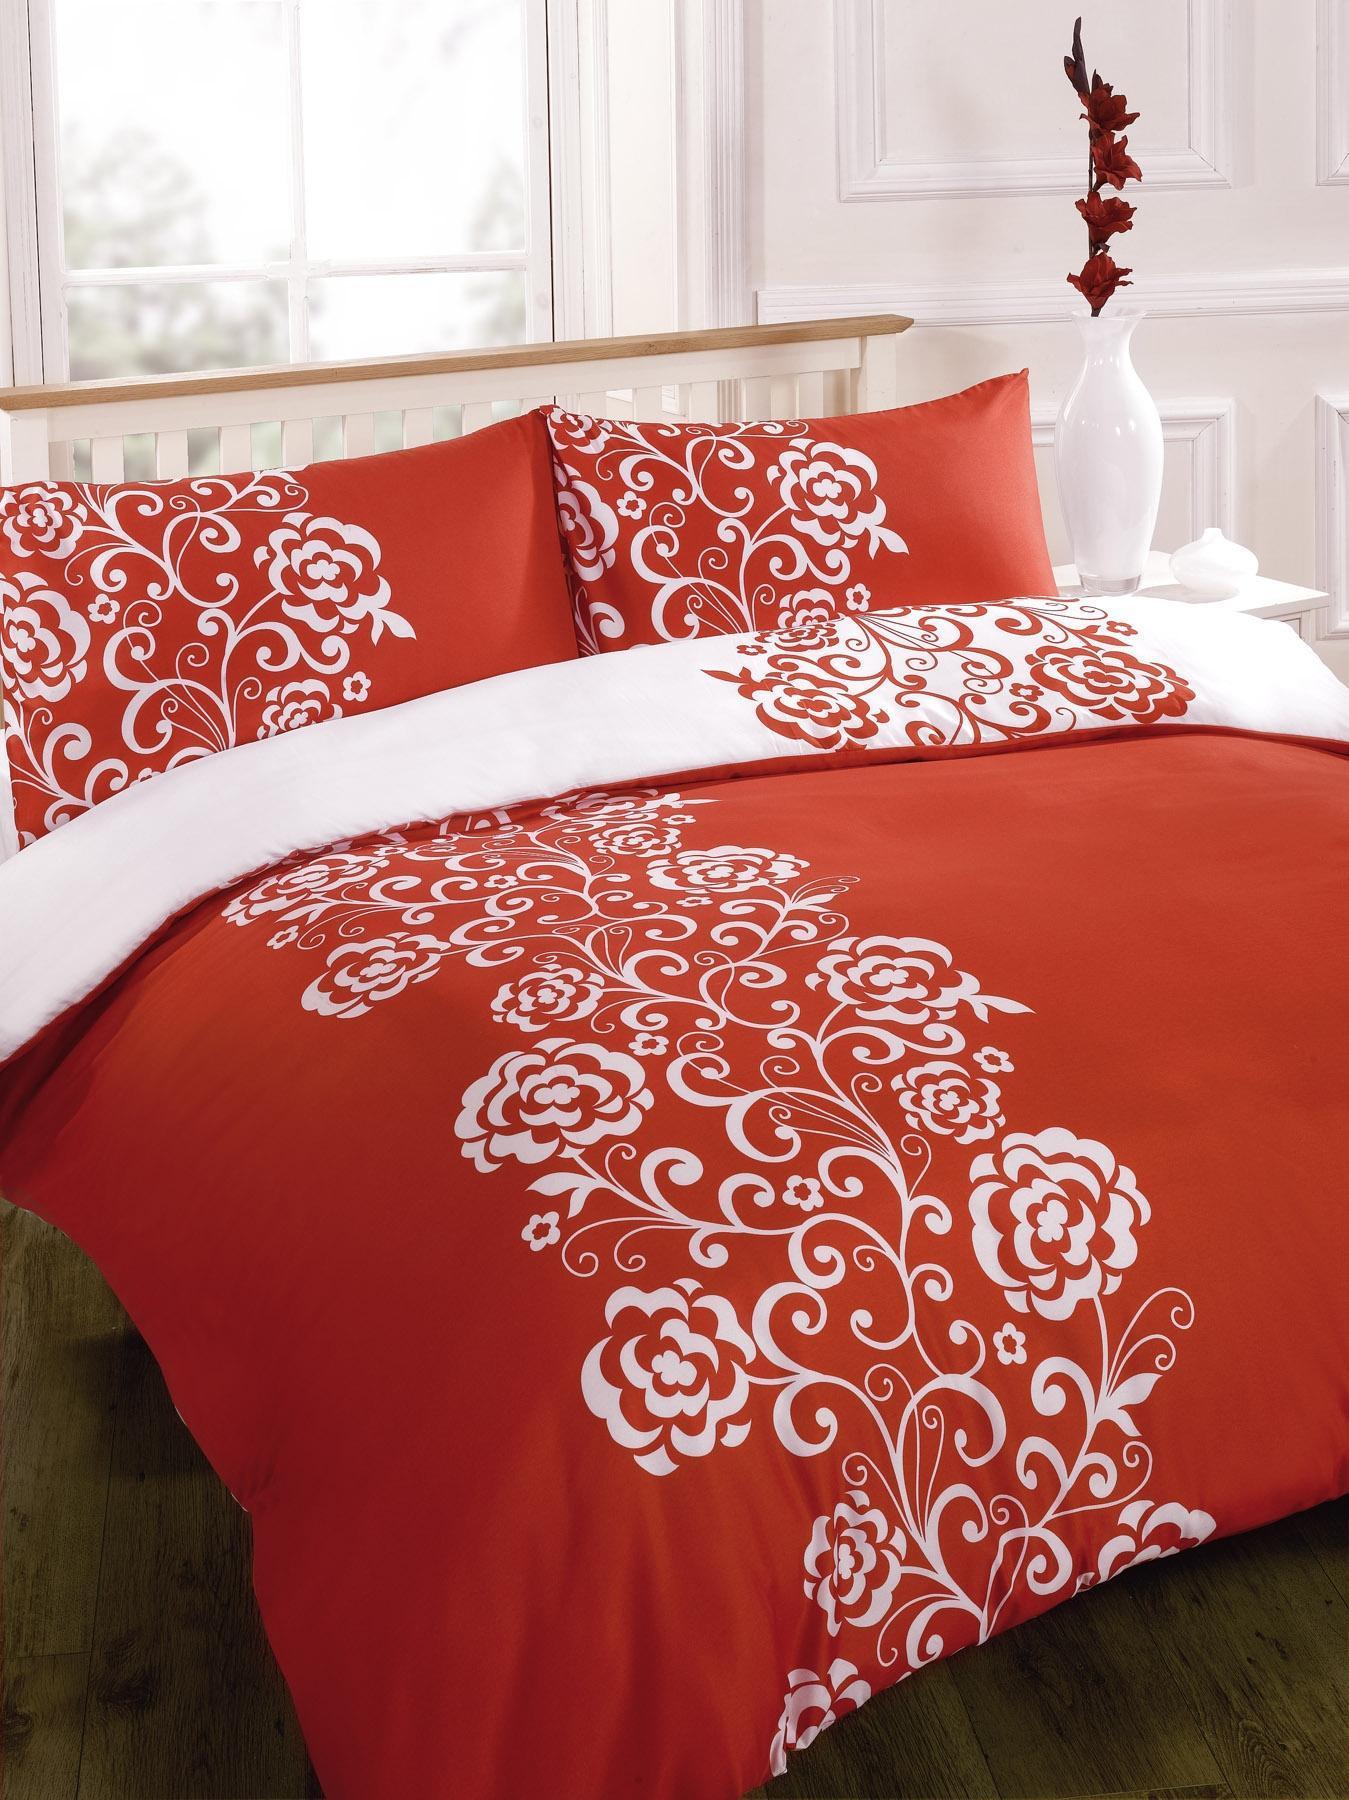 Duvet Quilt Cover Bedding Set Red Single Double King Kingsize Super